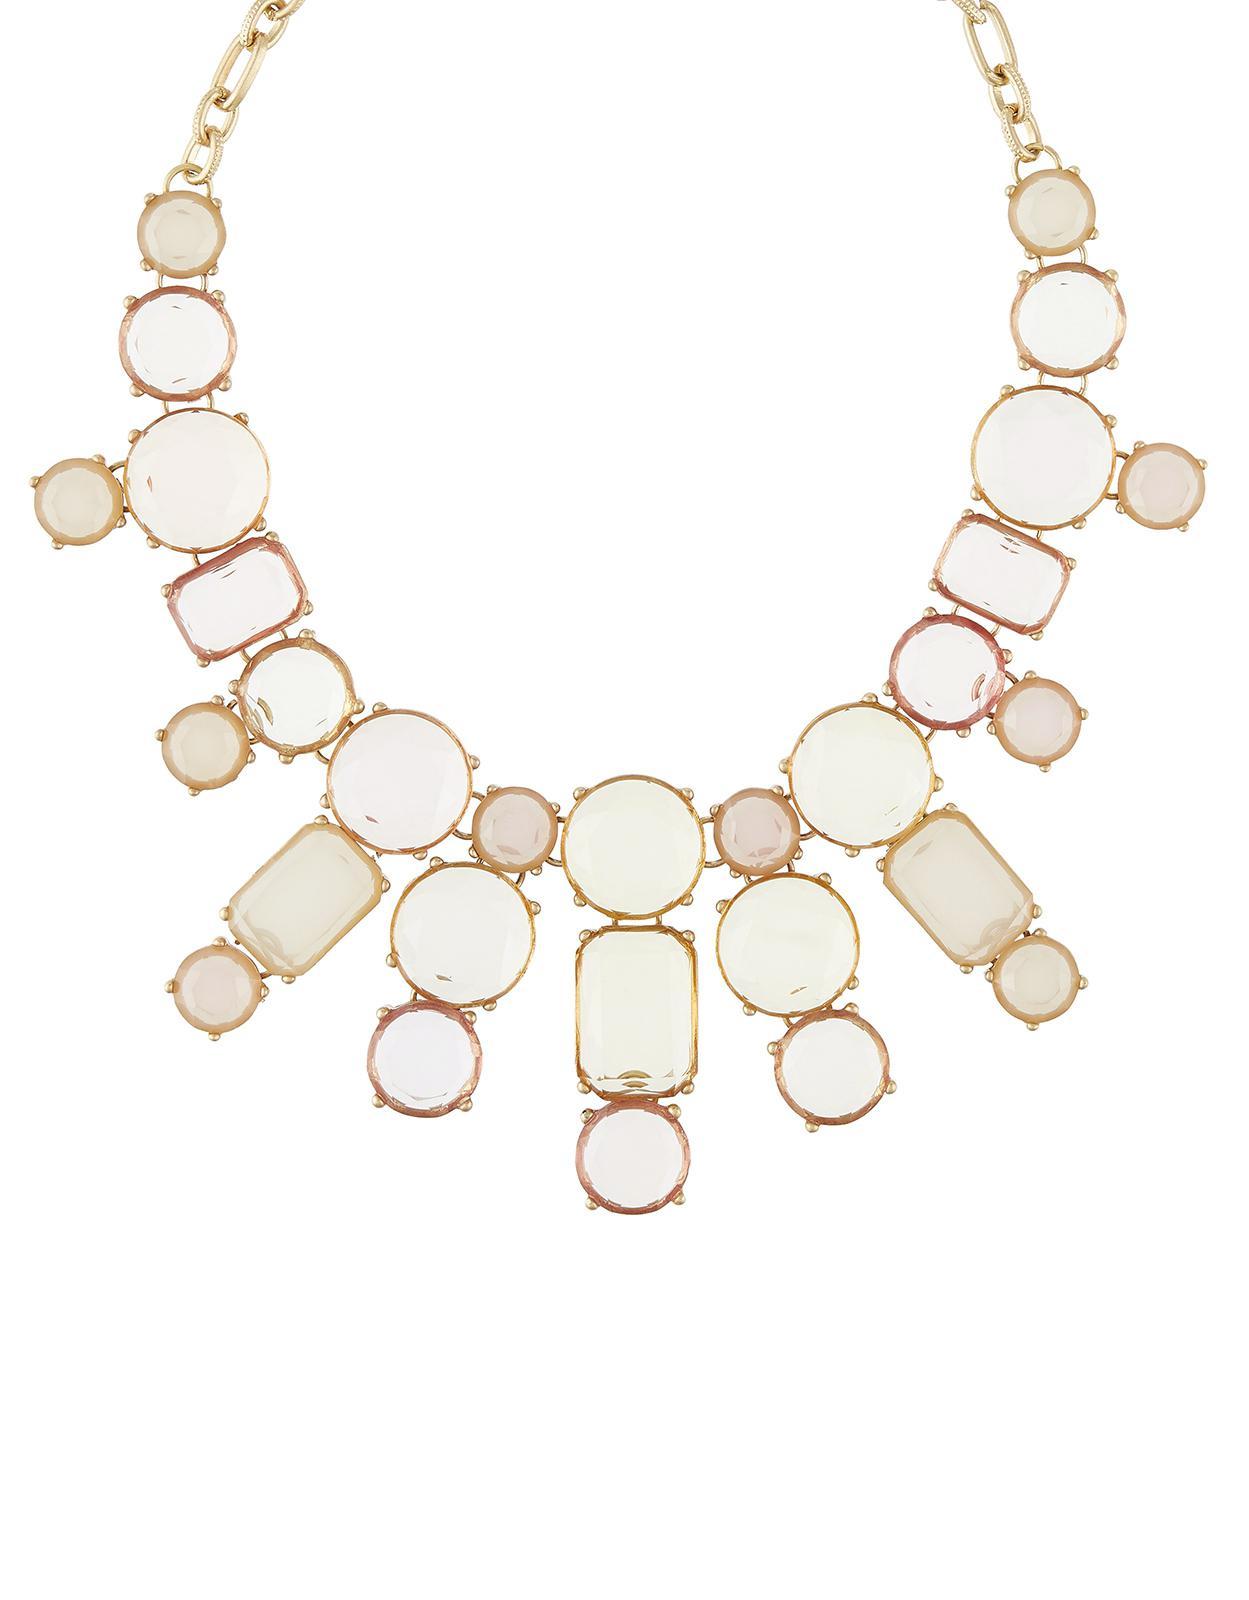 Accessorize Statement Gem Necklace in Pink